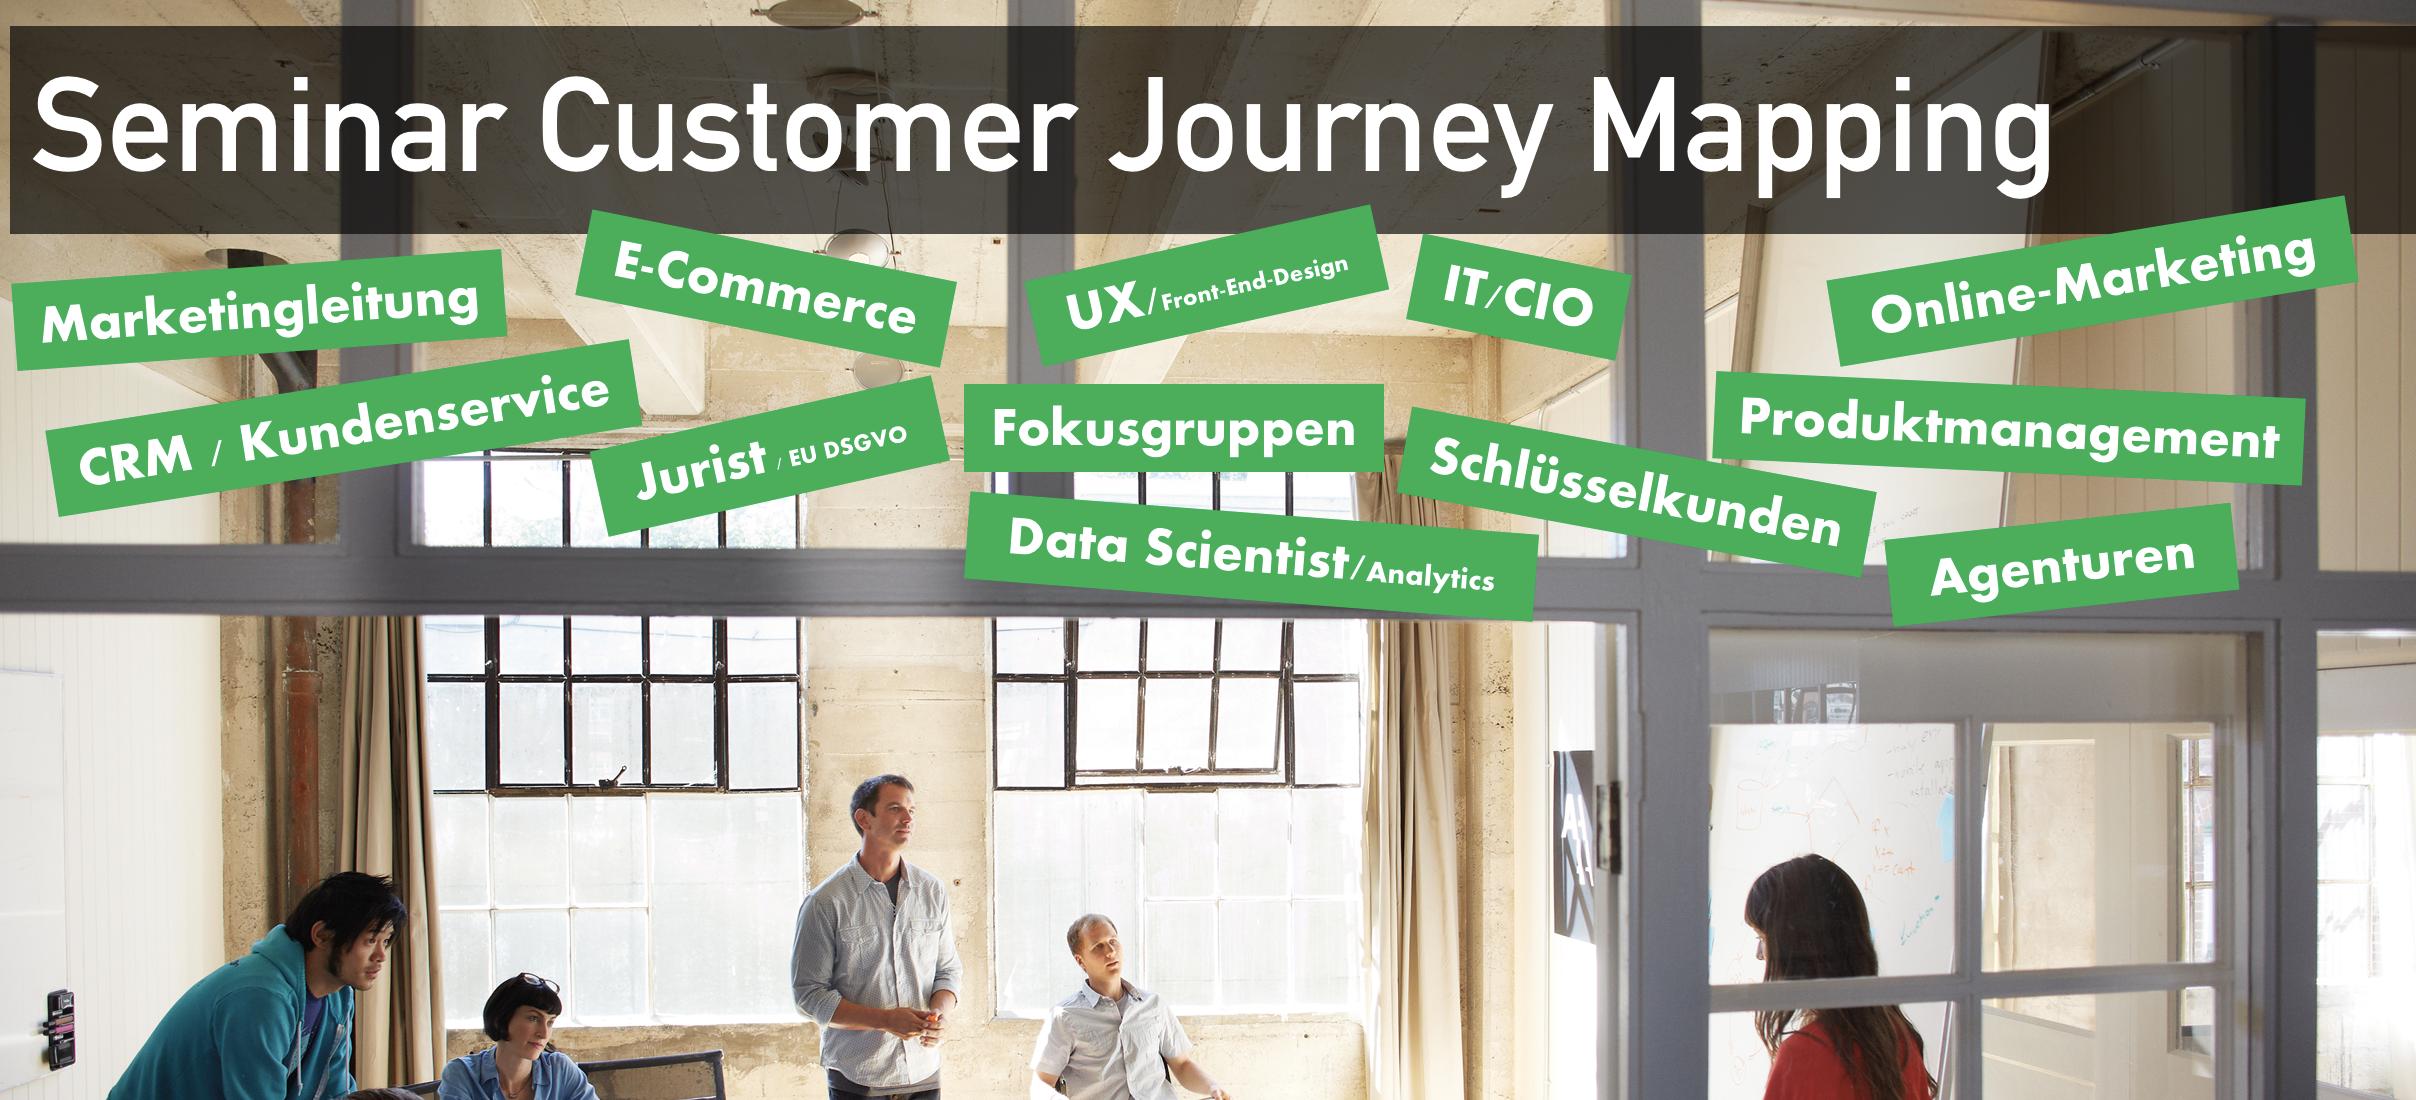 Seminar Customer Journey Mapping Mahrdt Media Economics Institut